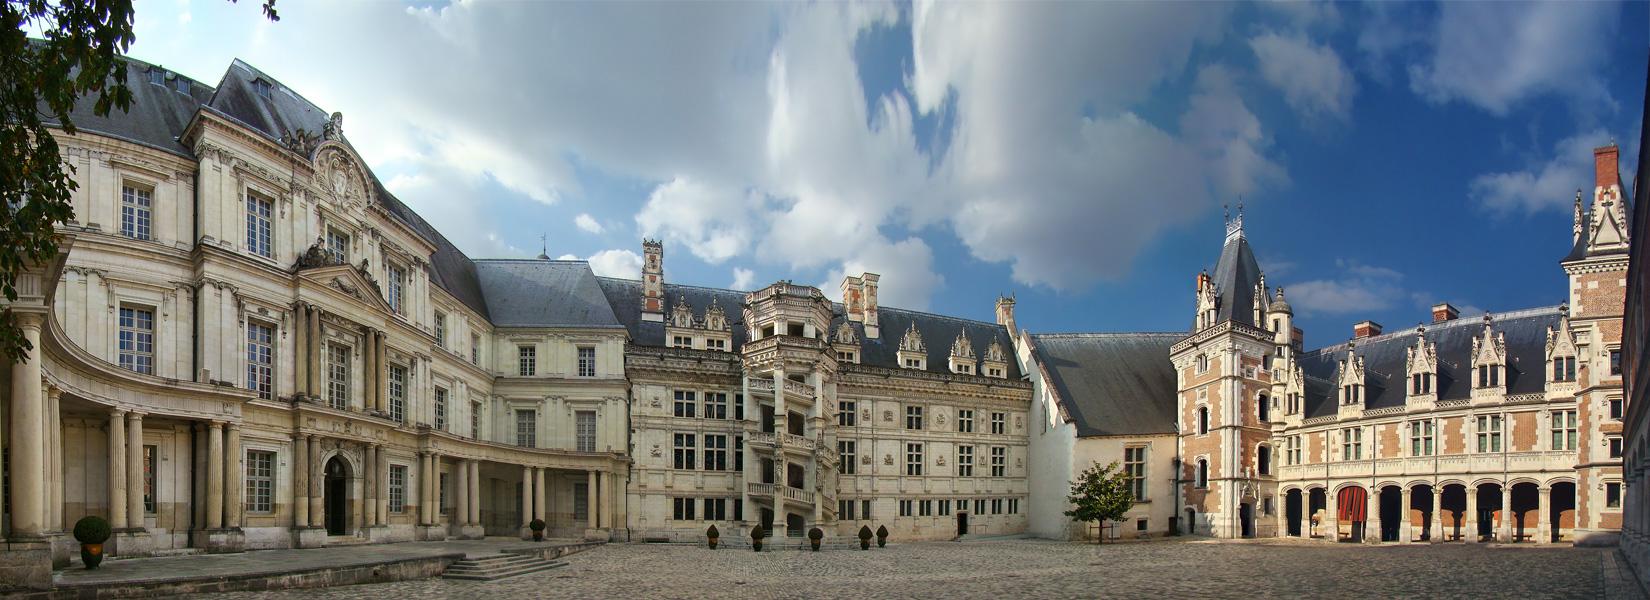 loire volgy kastélyok franciaország turizmus